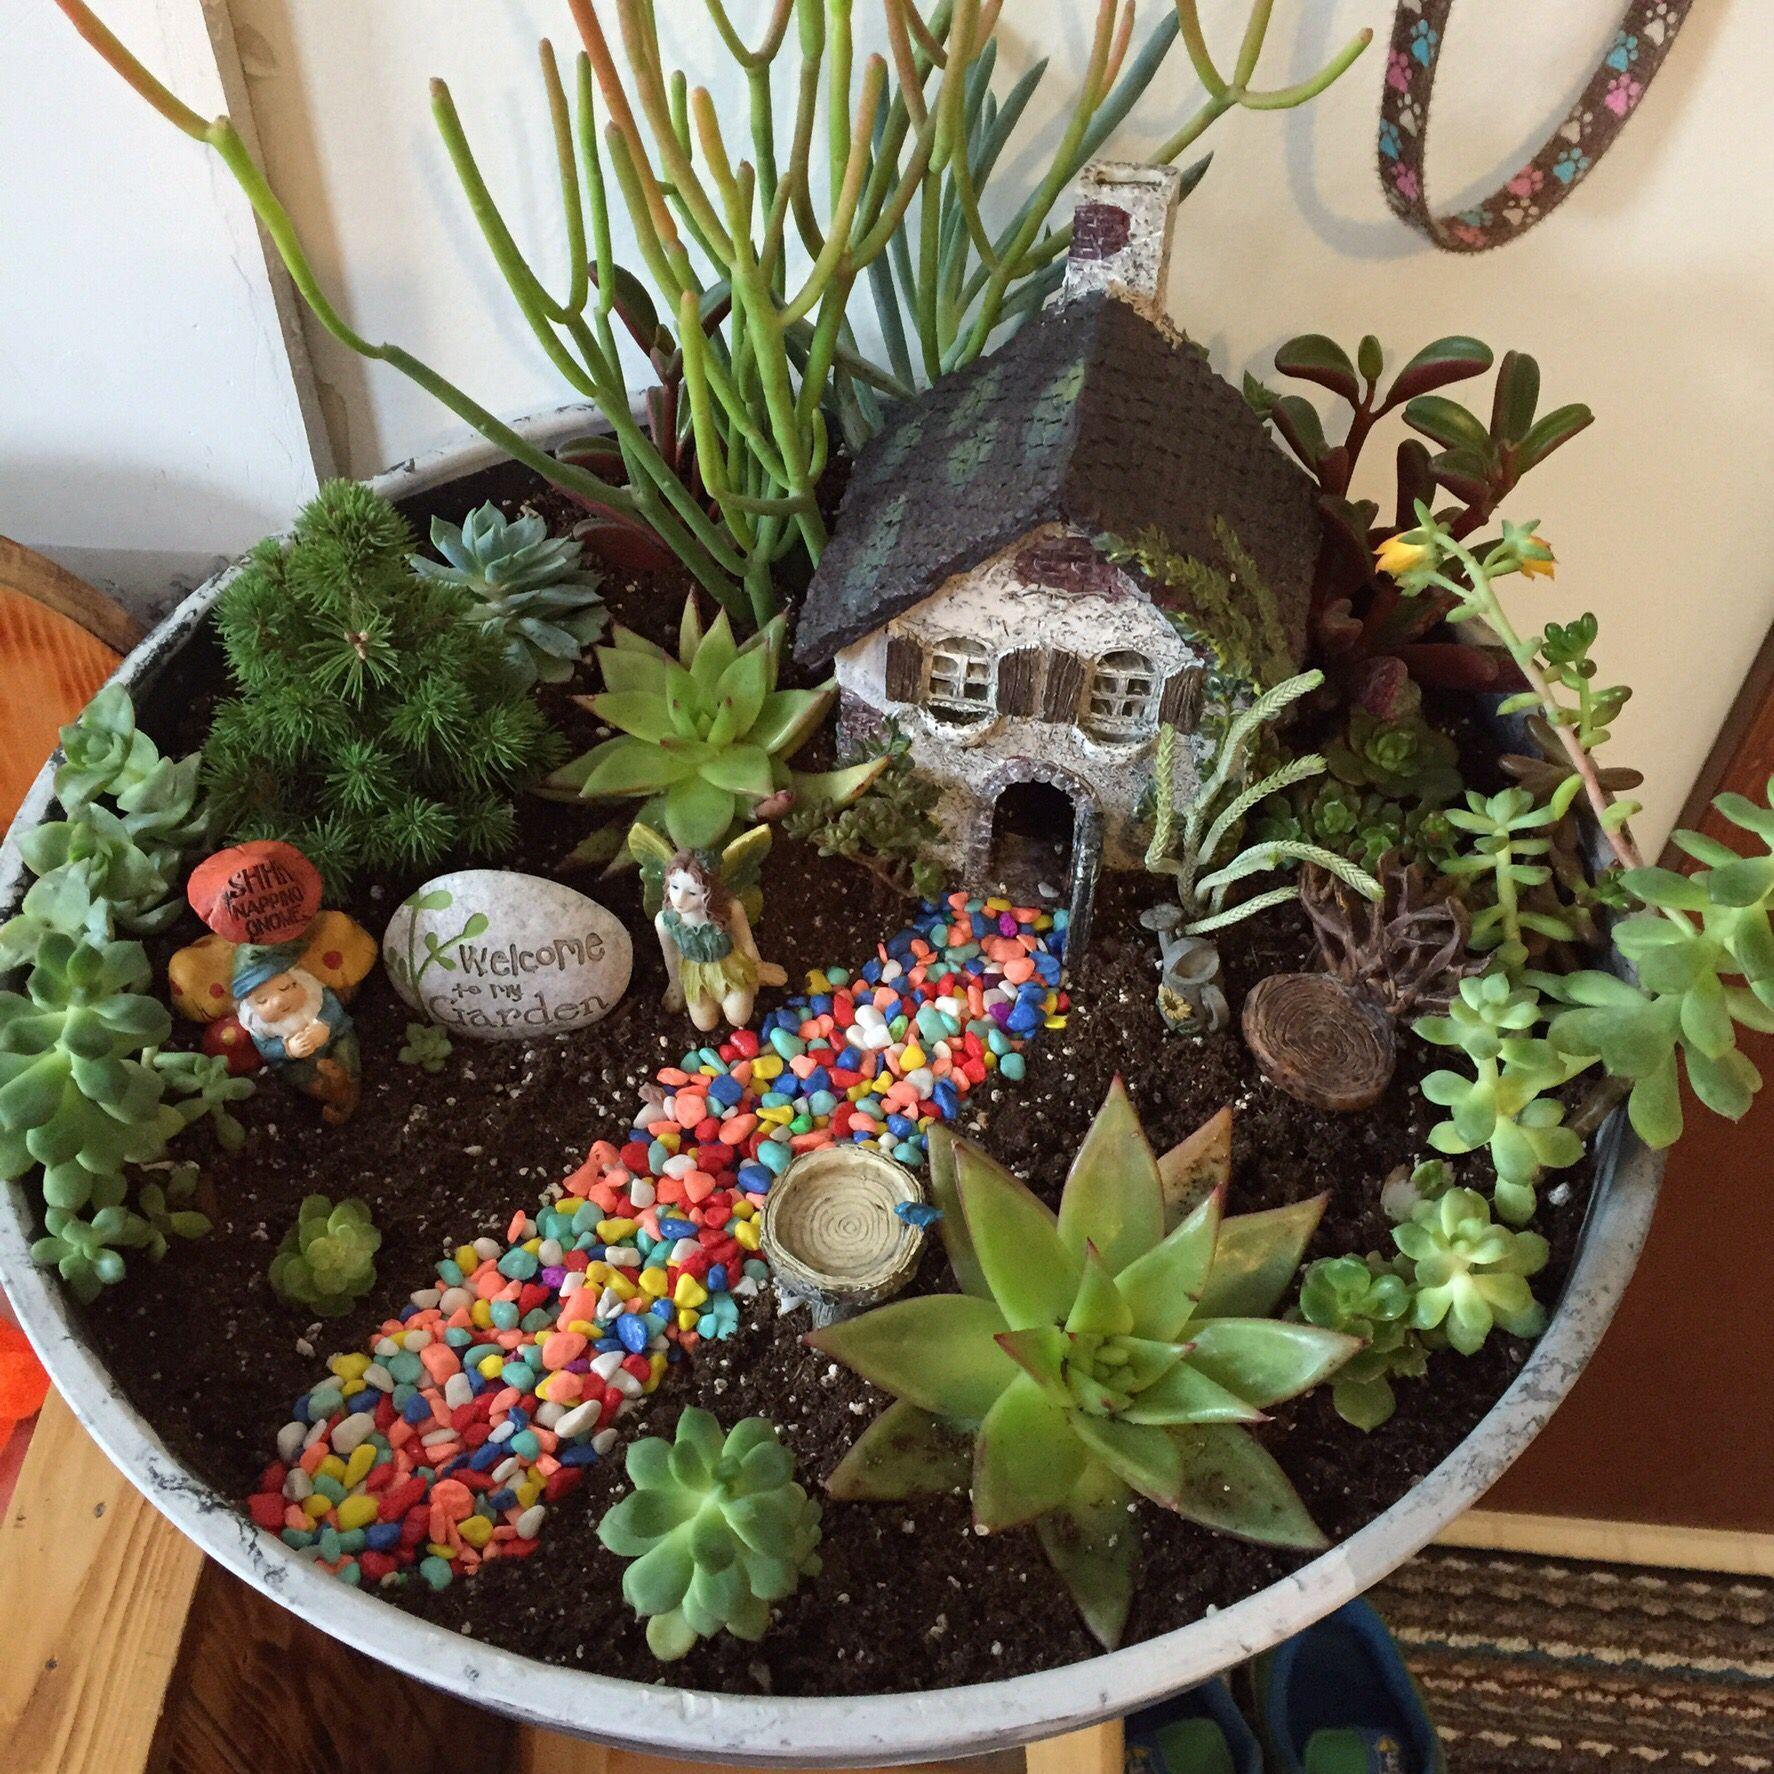 The 50 Best Diy Miniature Fairy Garden Ideas In 2019: 50 Magical And Best Plants DIY Fairy Garden Inspirations